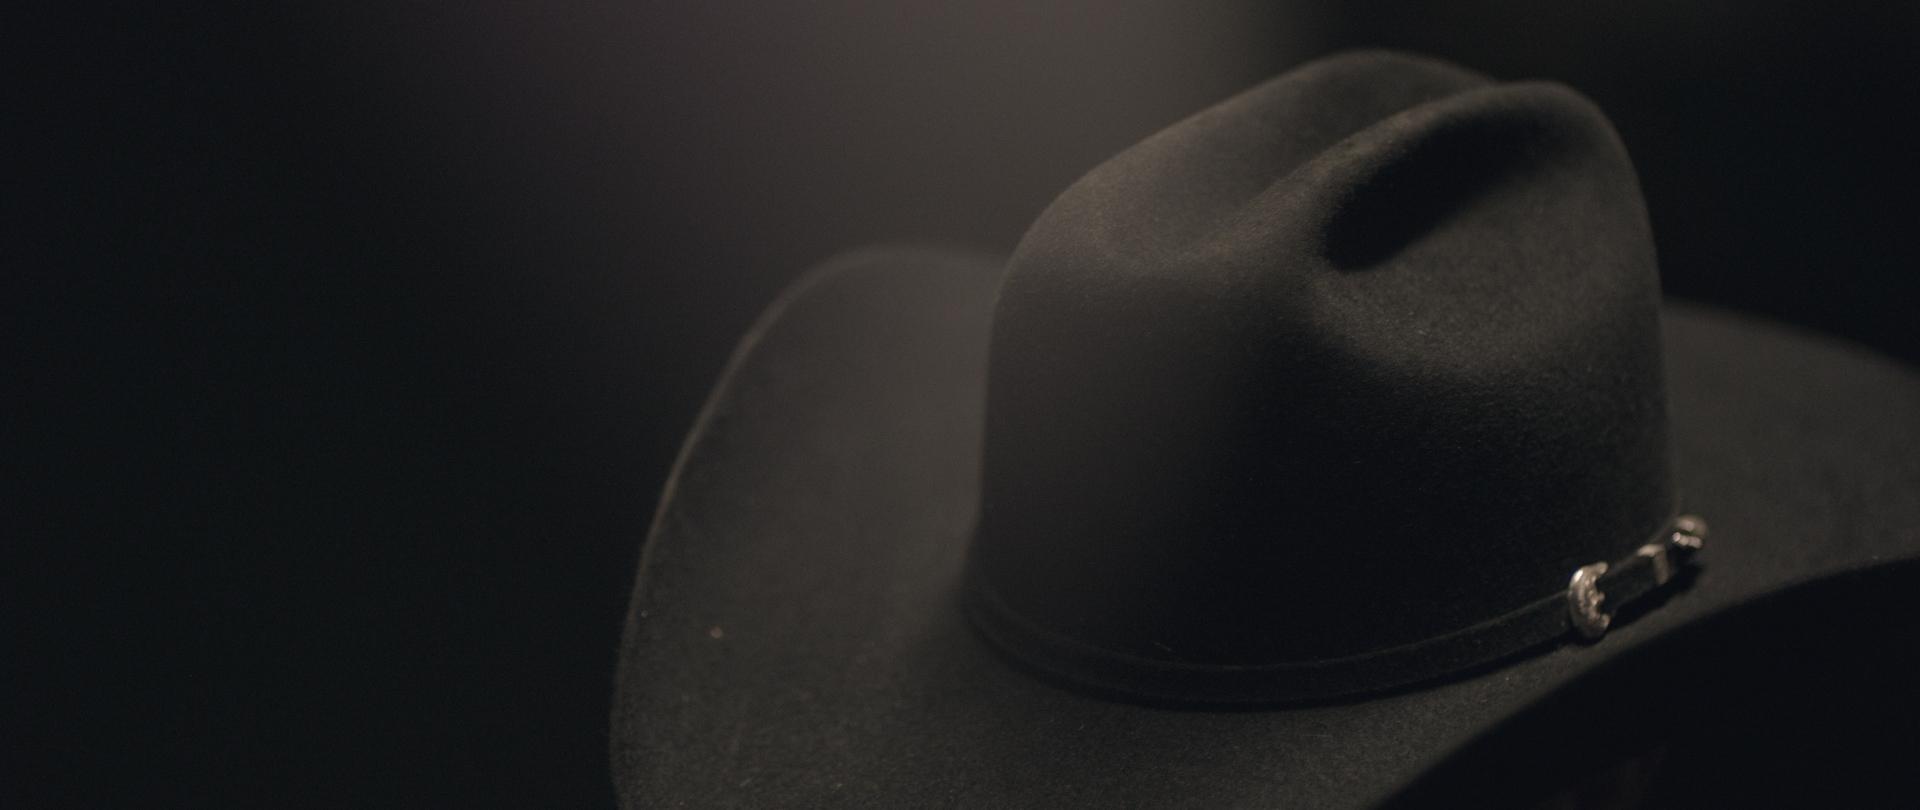 cowboy hat_1.10.1.jpg